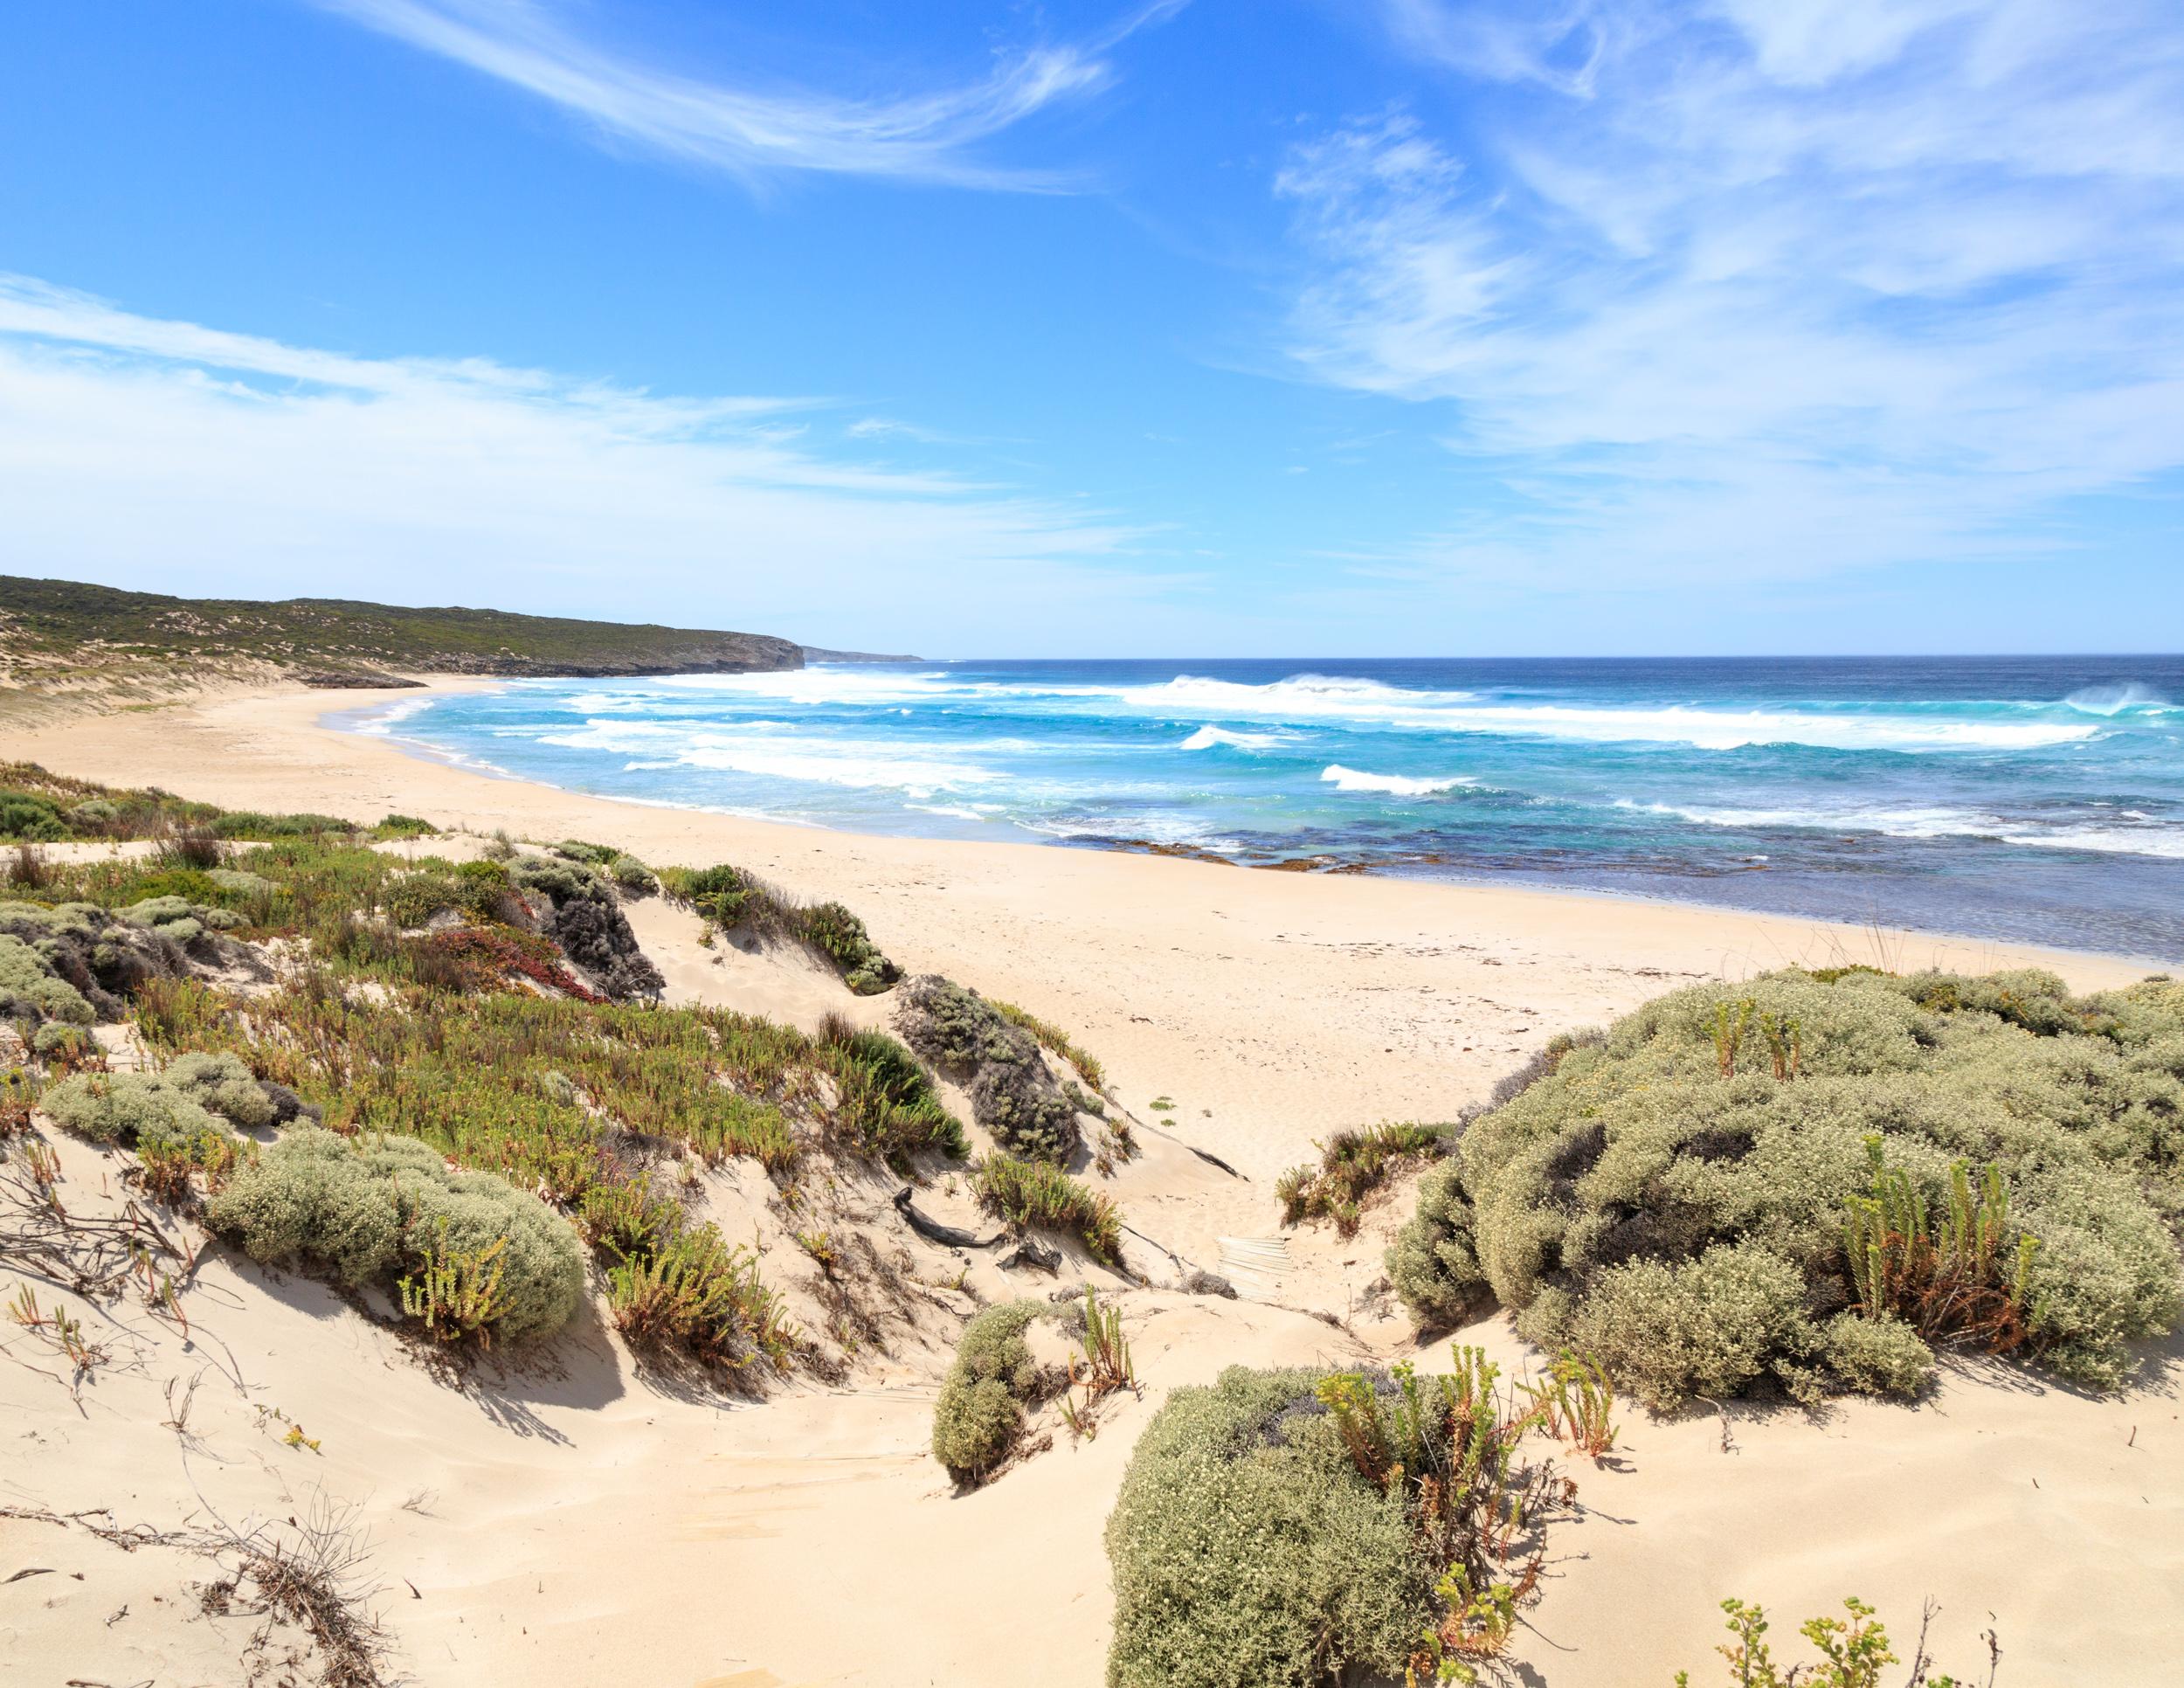 The view of Hanson Bay Beach